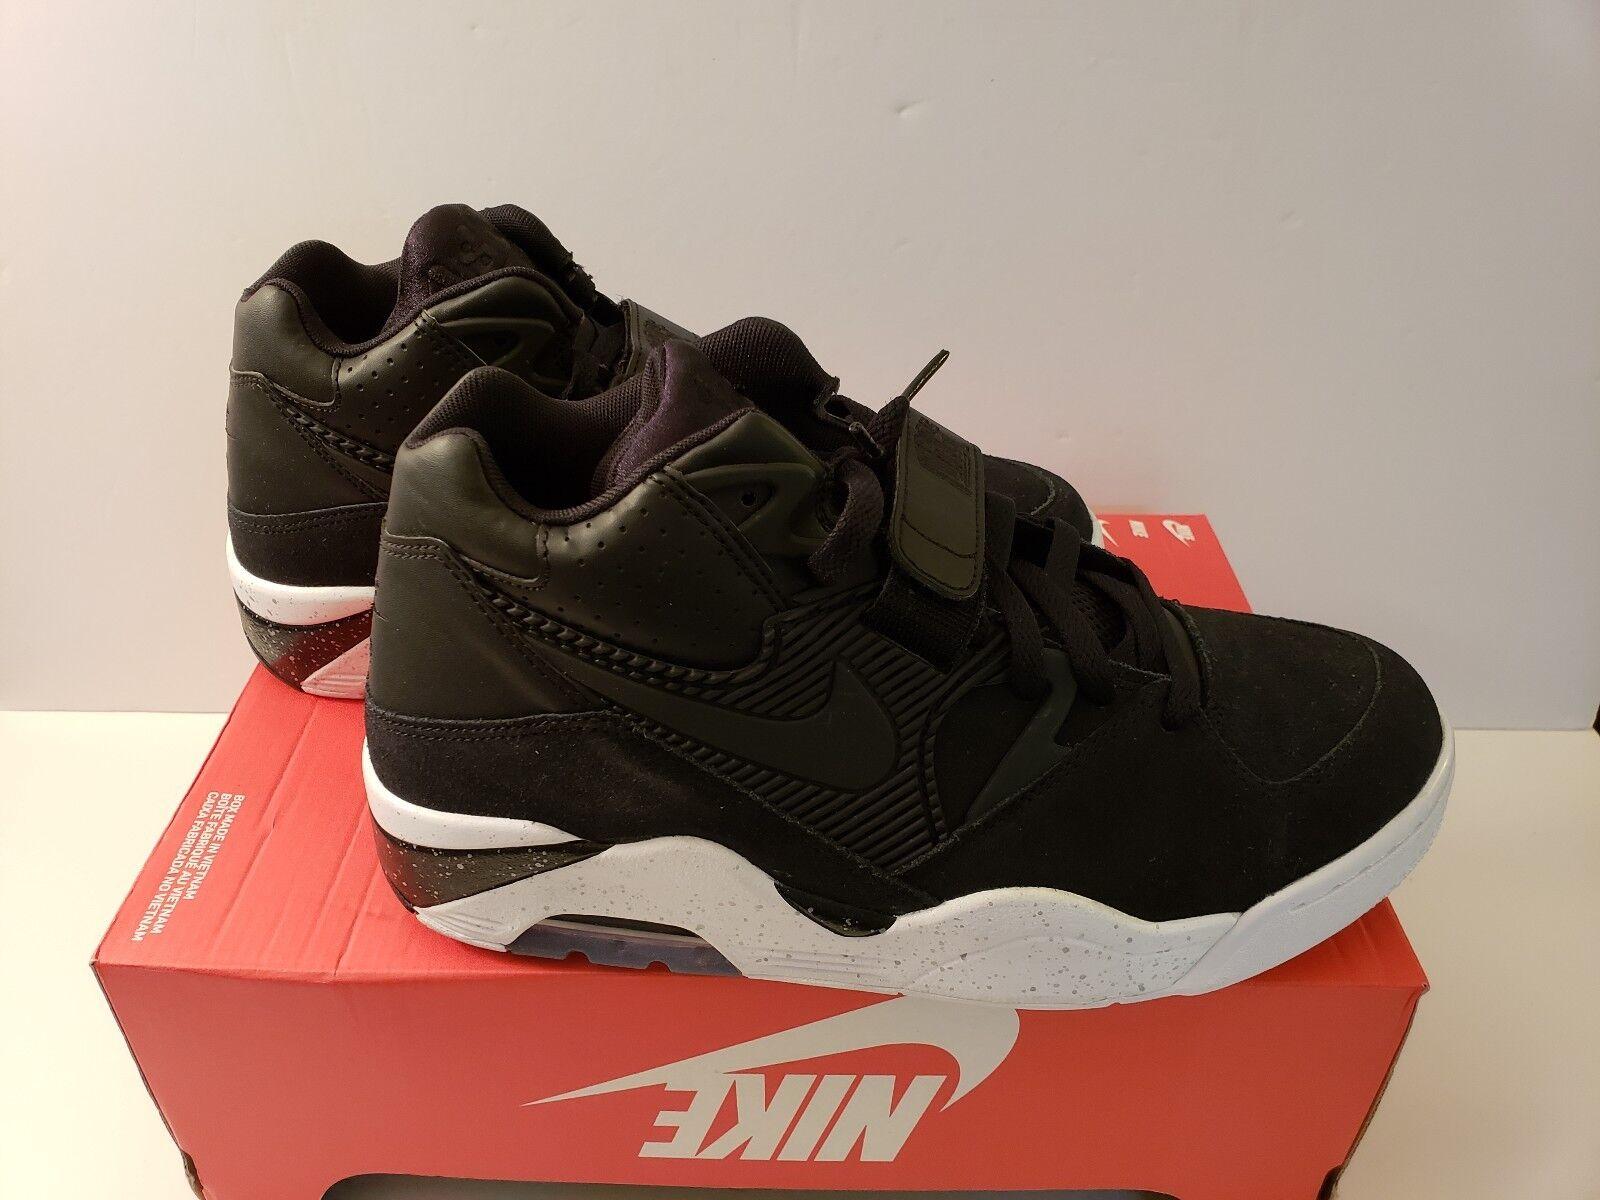 Nike Air Force 180 Basketball shoes Black-White 310095-003 Barkley Sz 9.5 & 10